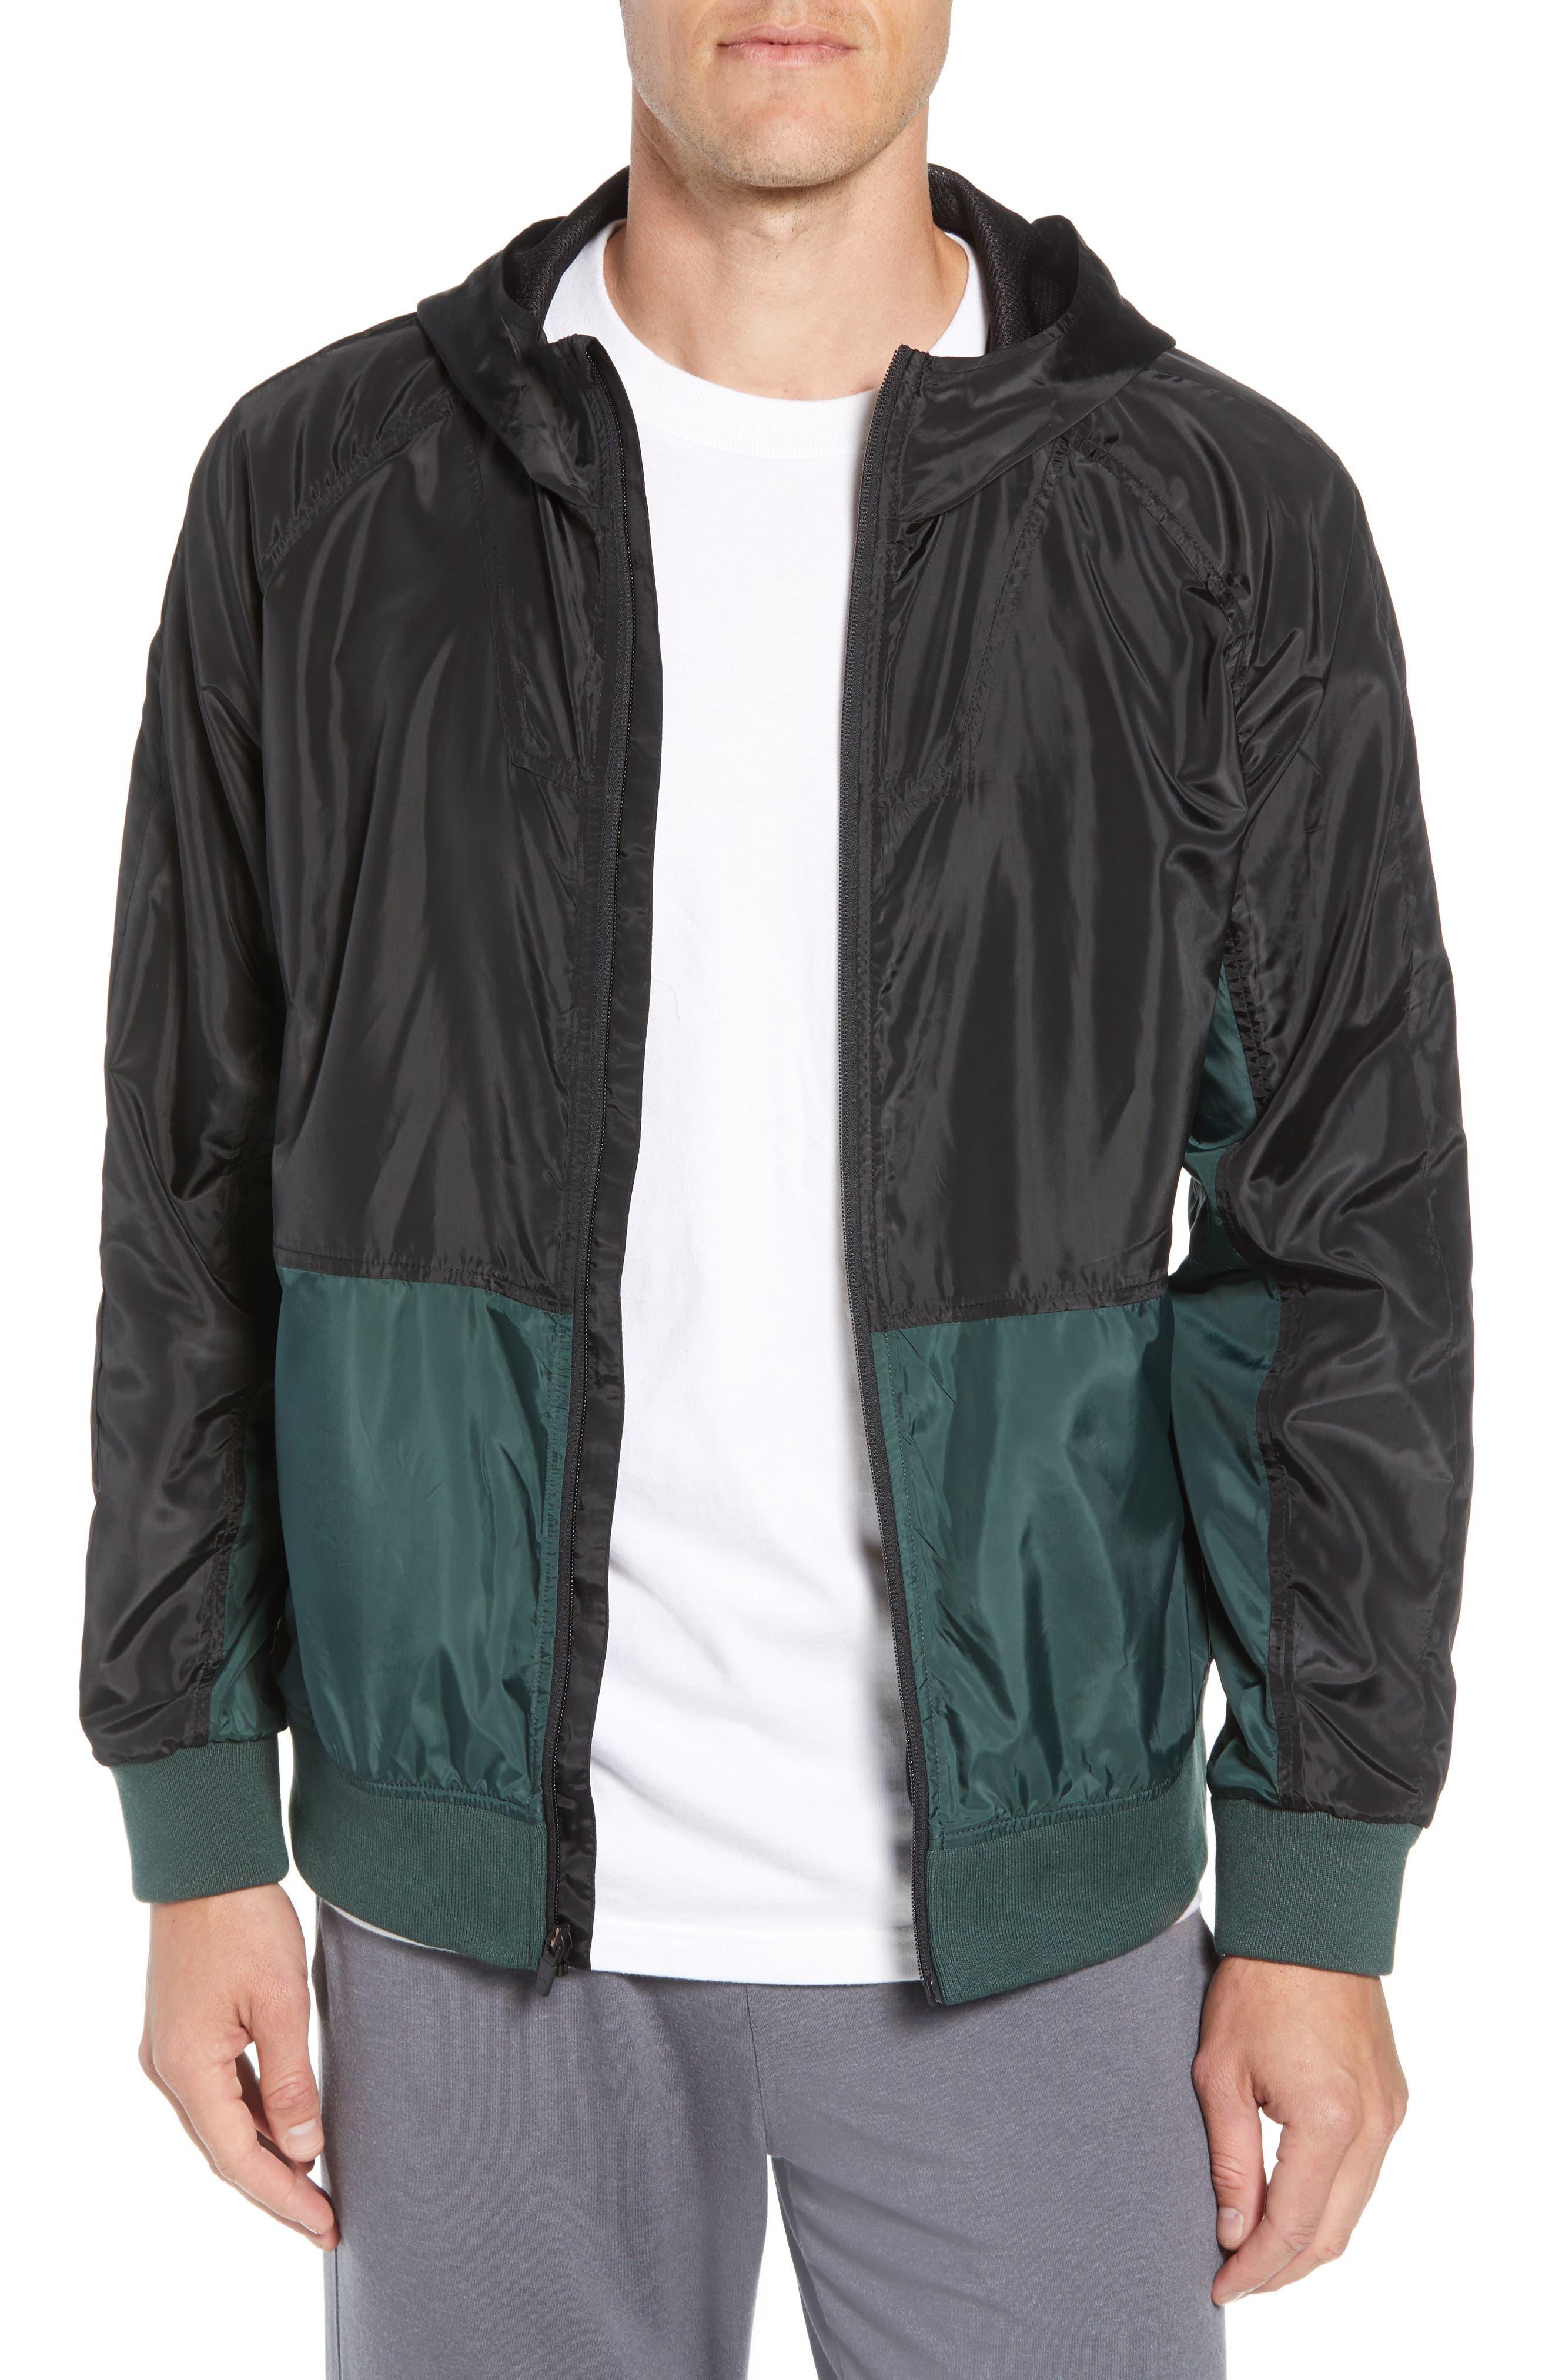 Colorblock Hooded Windbreaker Jacket,                         Main,                         color, BLACK GREEN ODINITE